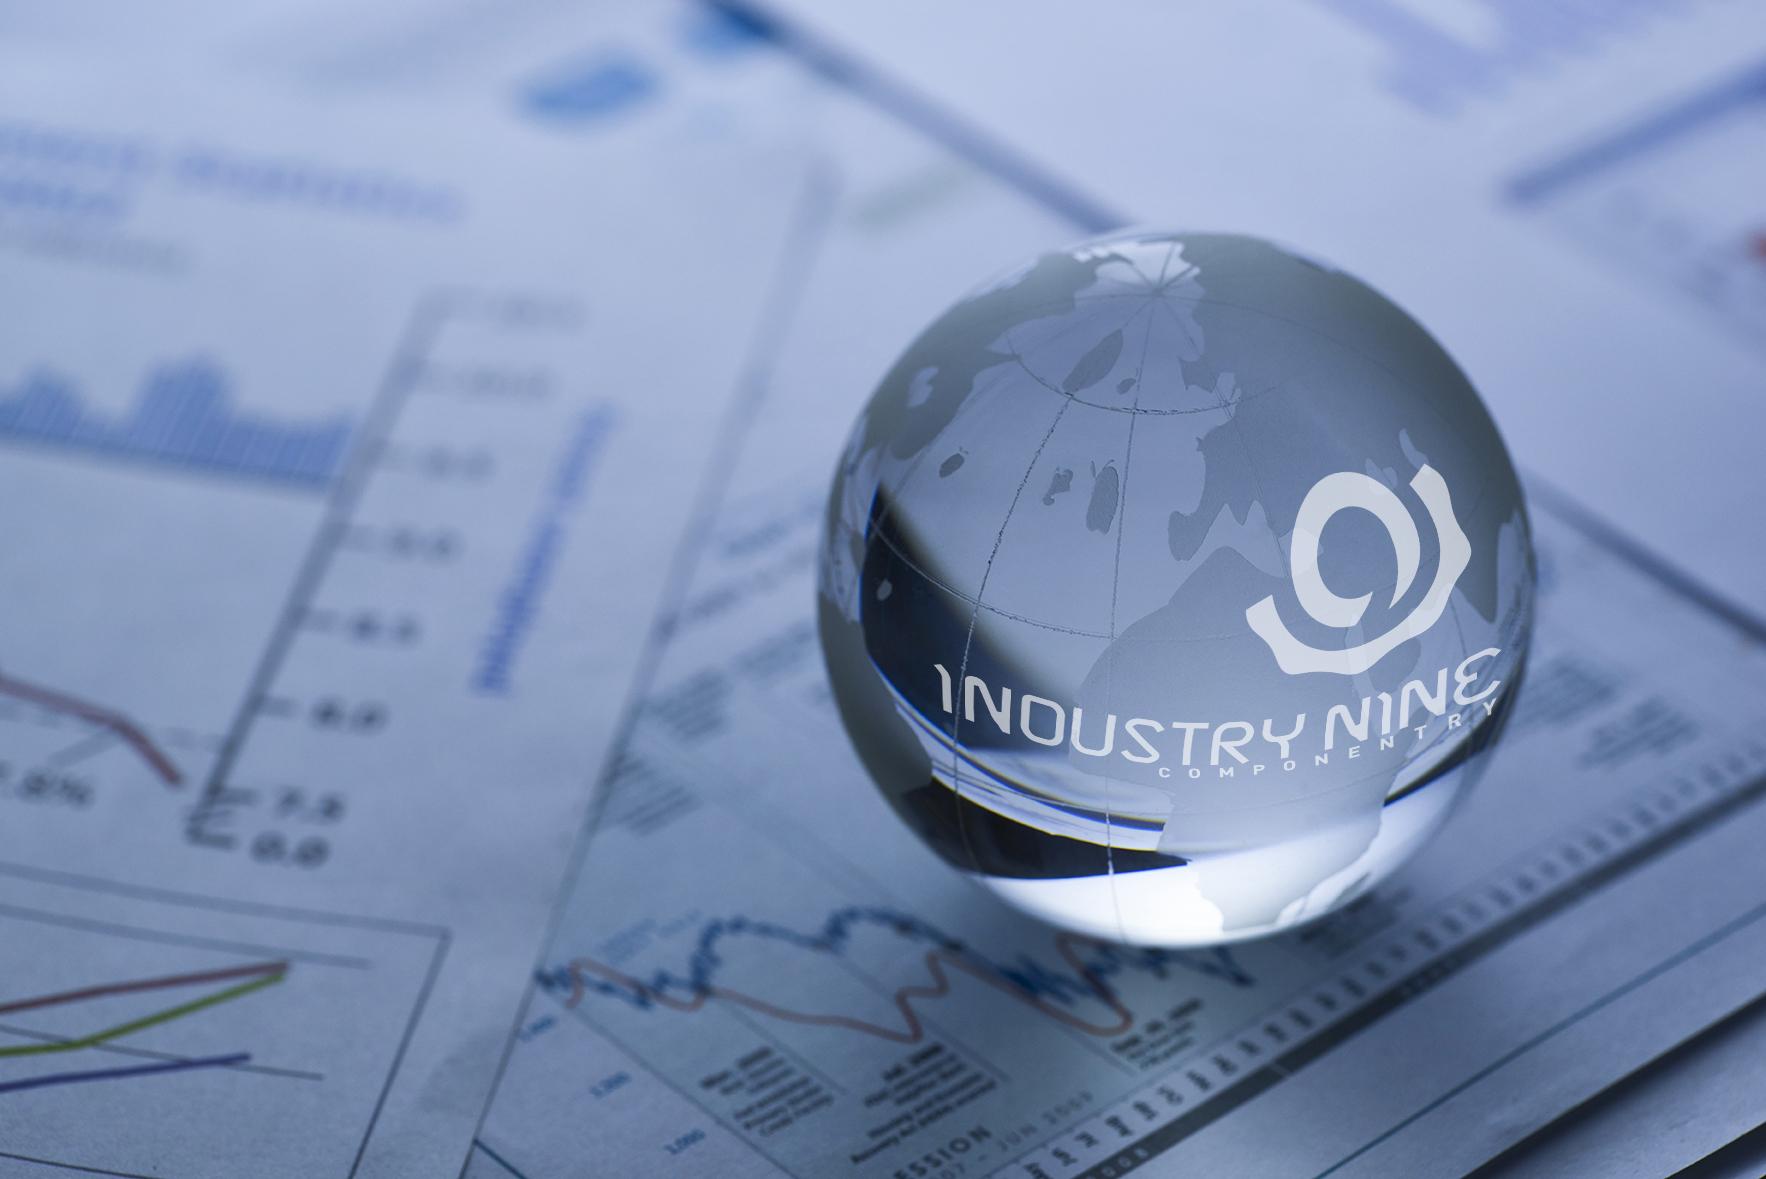 Industry Nine Global image small.jpg